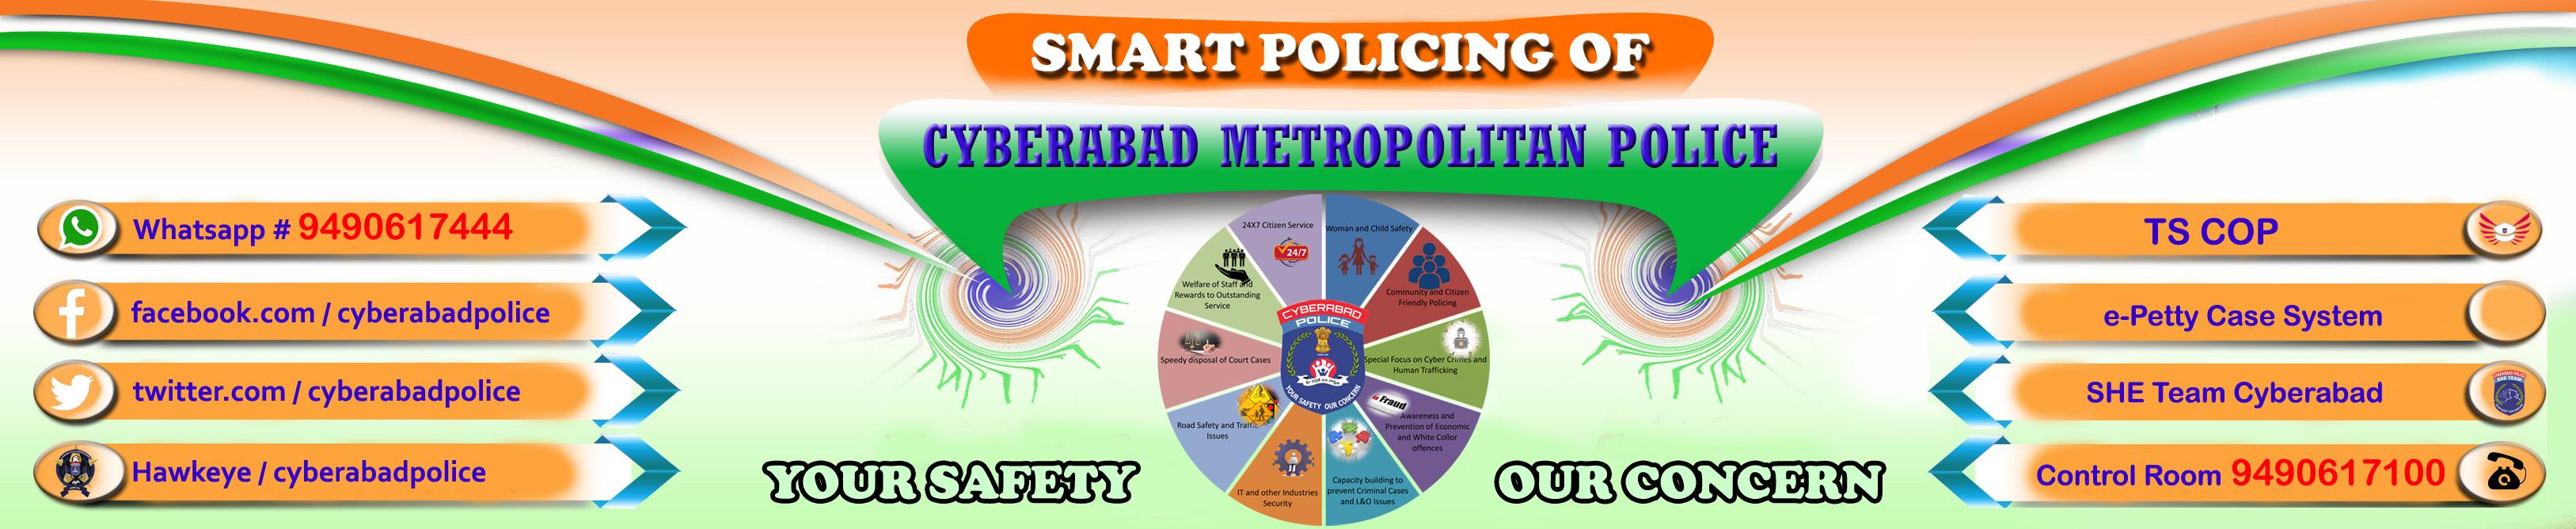 Cyberabad Metropolitan Police